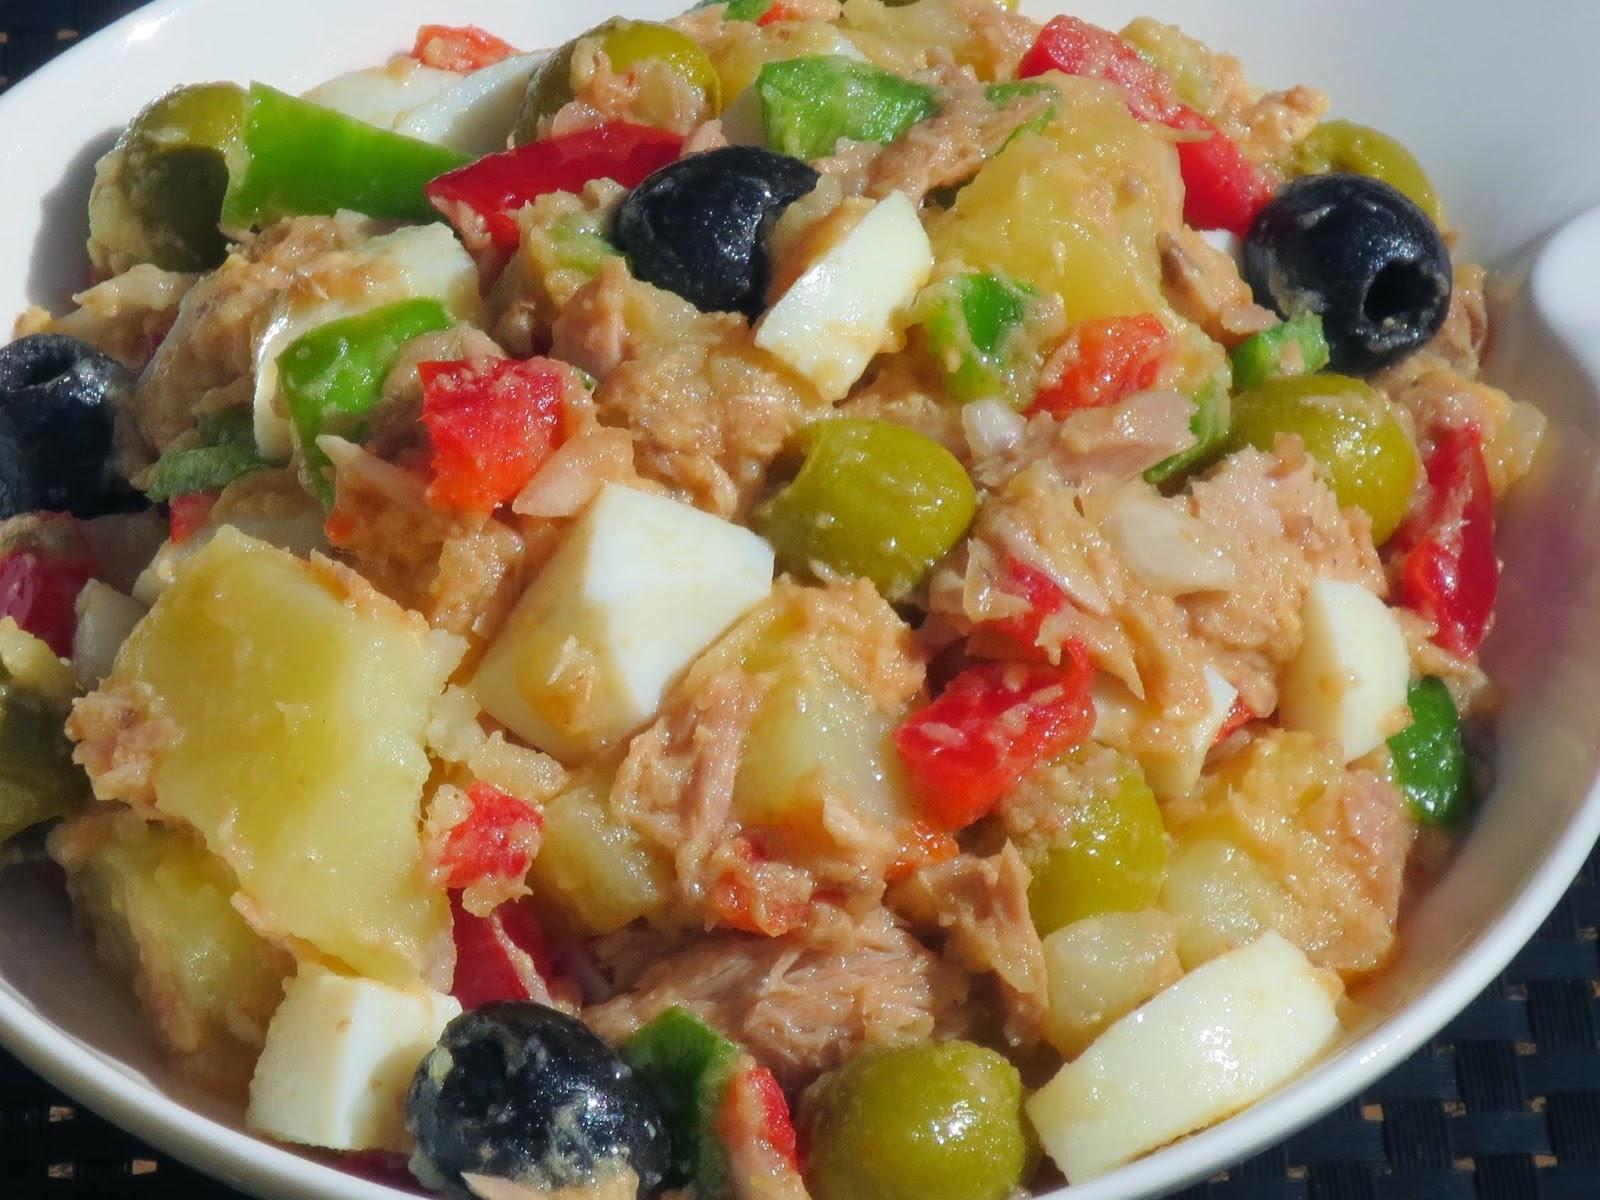 Ensalada campera for Cocina tradicional